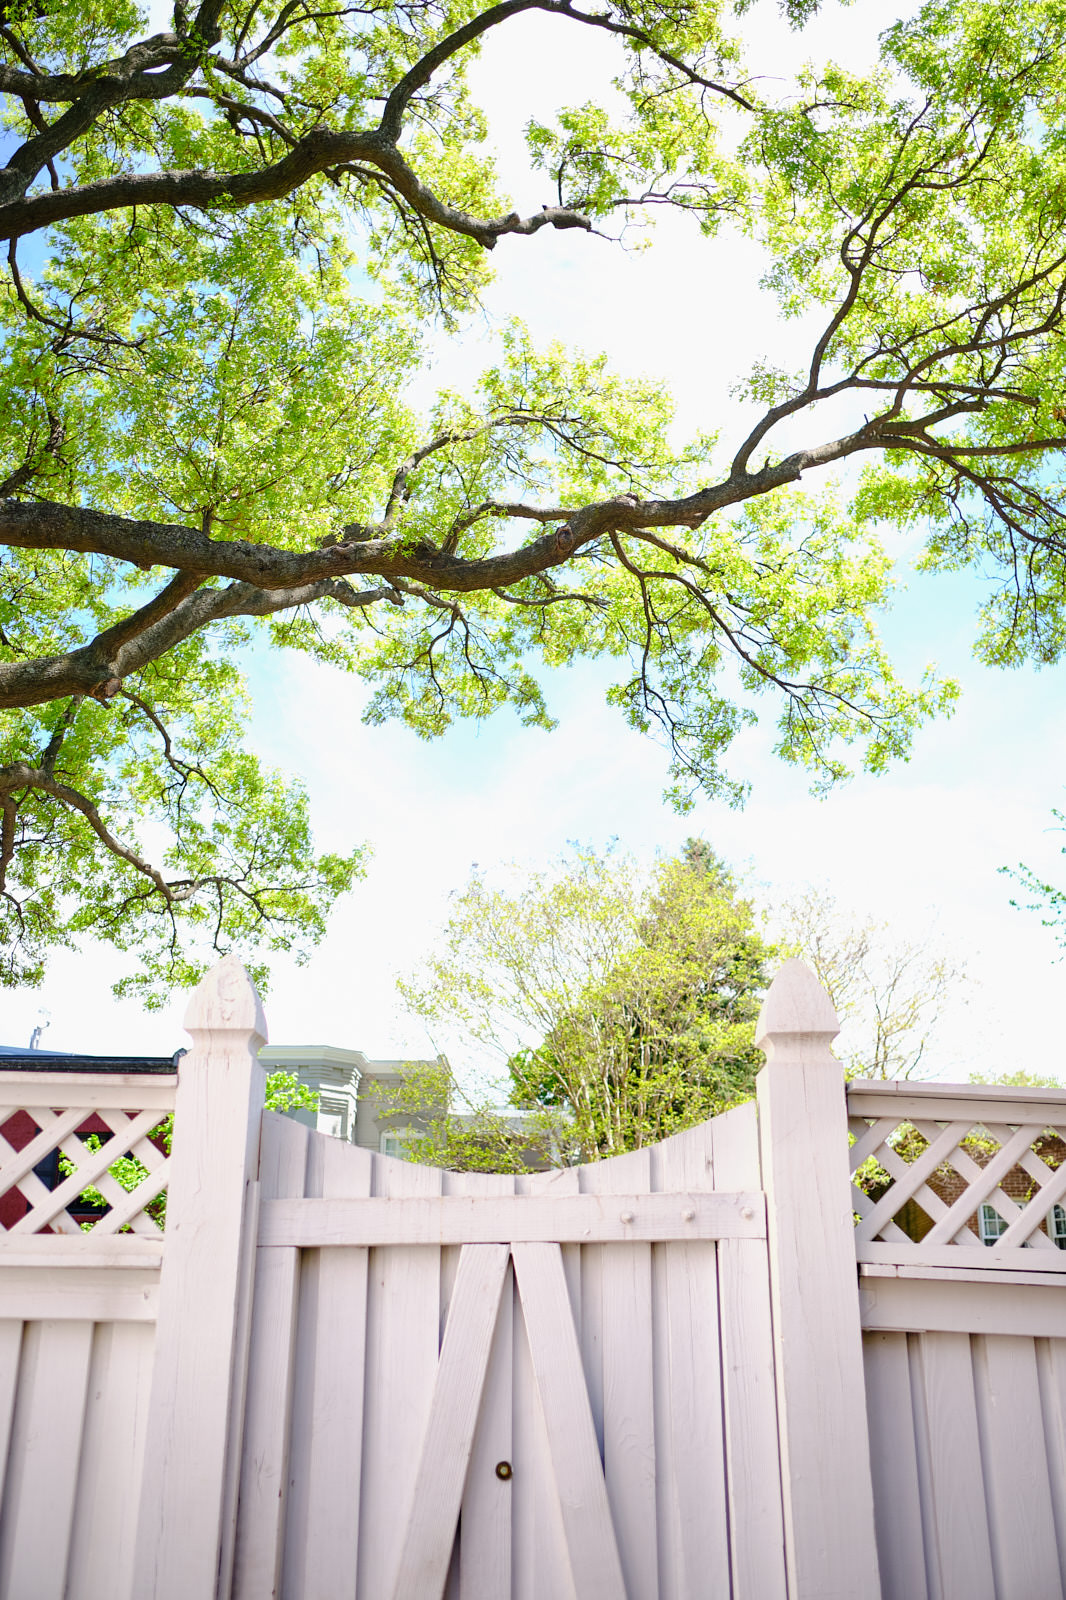 Photoguzman_SummerInTheCity_003.jpg